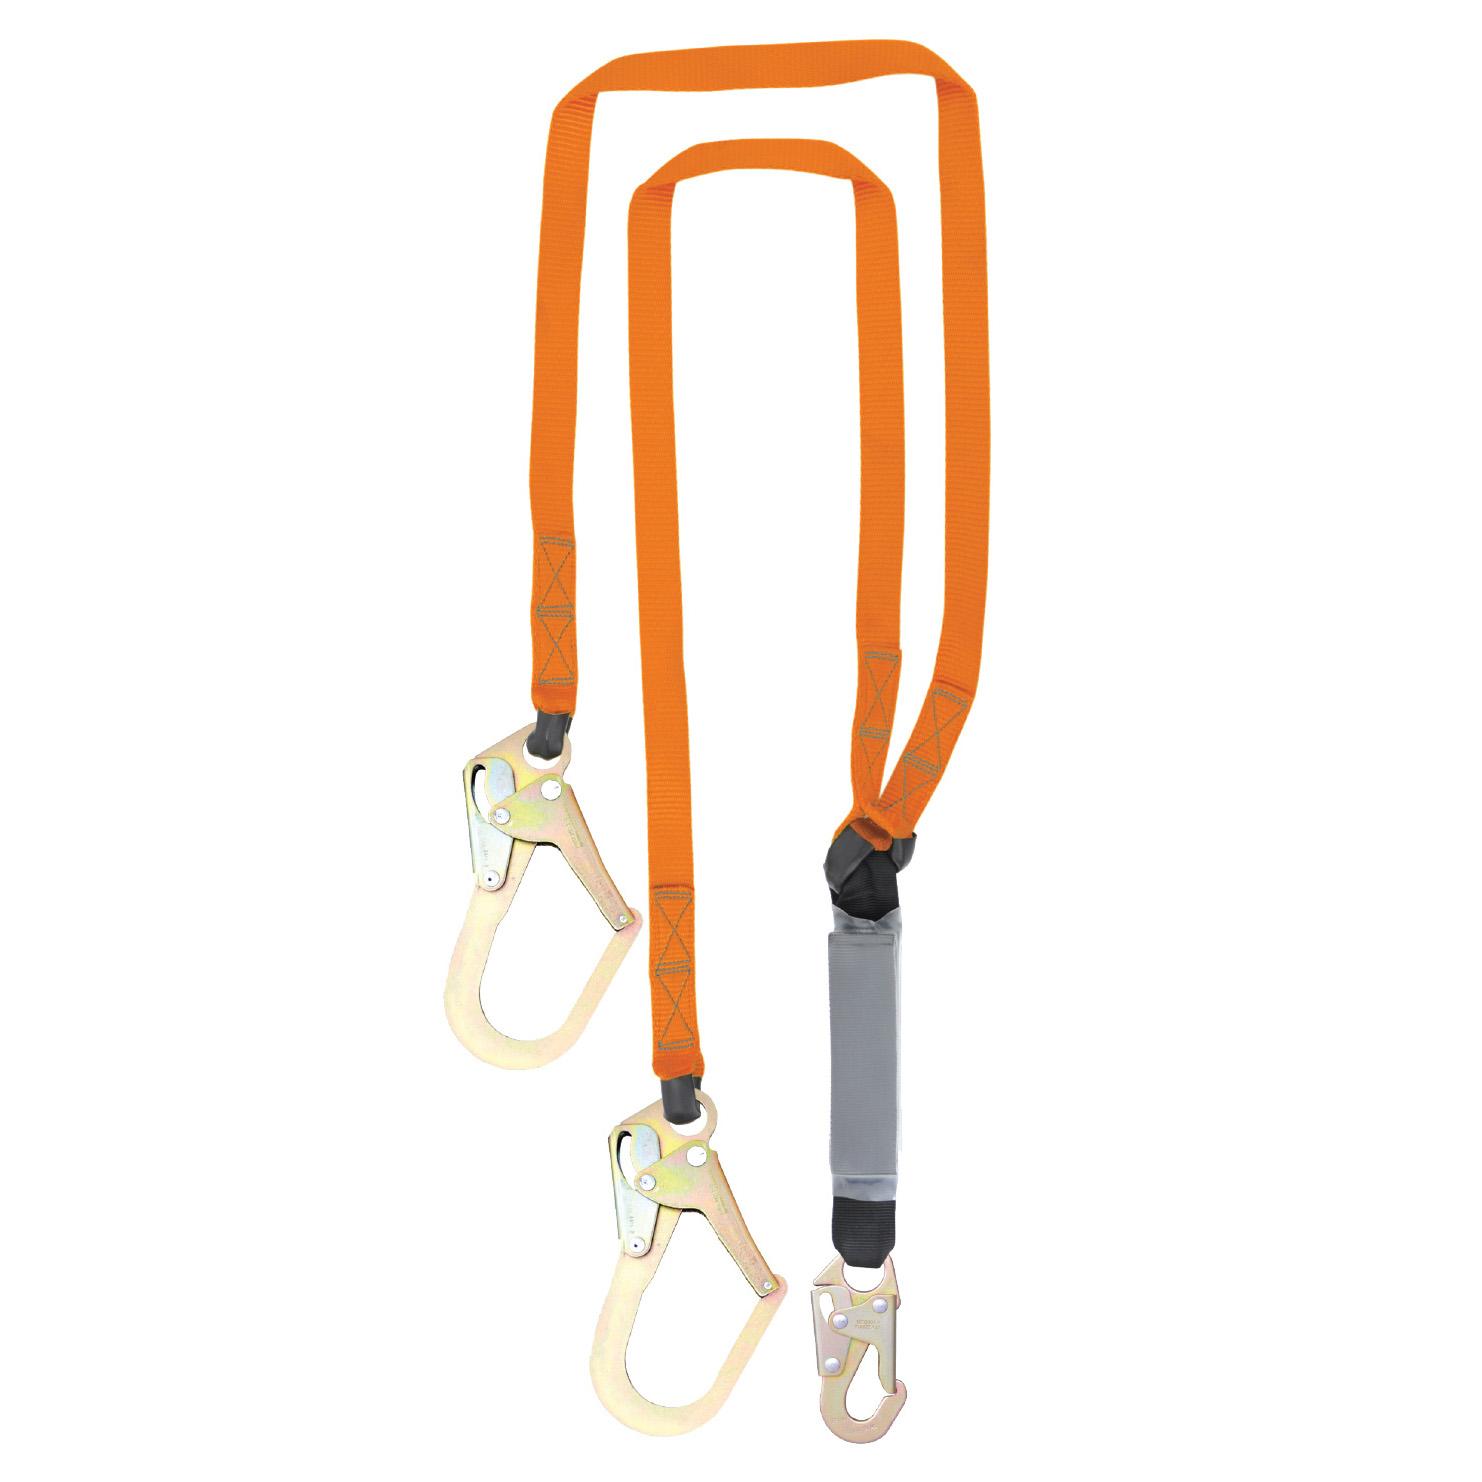 C5015-6/' Single Leg Internal Shock Absorbing Lanyard with 1 Rebar Hook and 1 Steel Snap Hook OSHA//ANSI Compliant